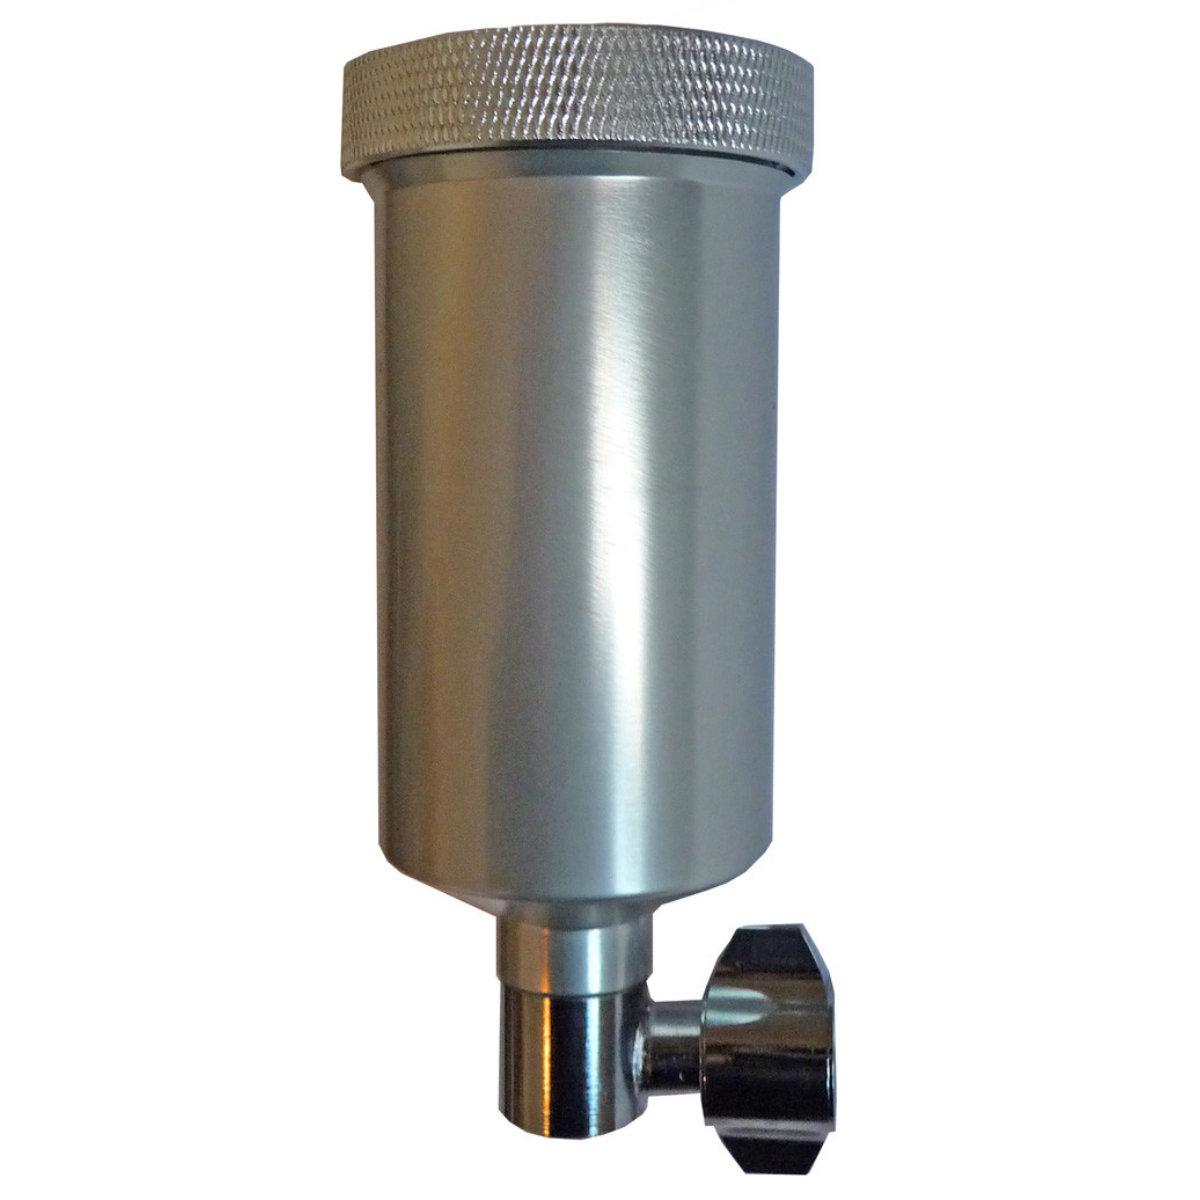 Fuji 3 oz Gravity Cup TEFLON SprayTan